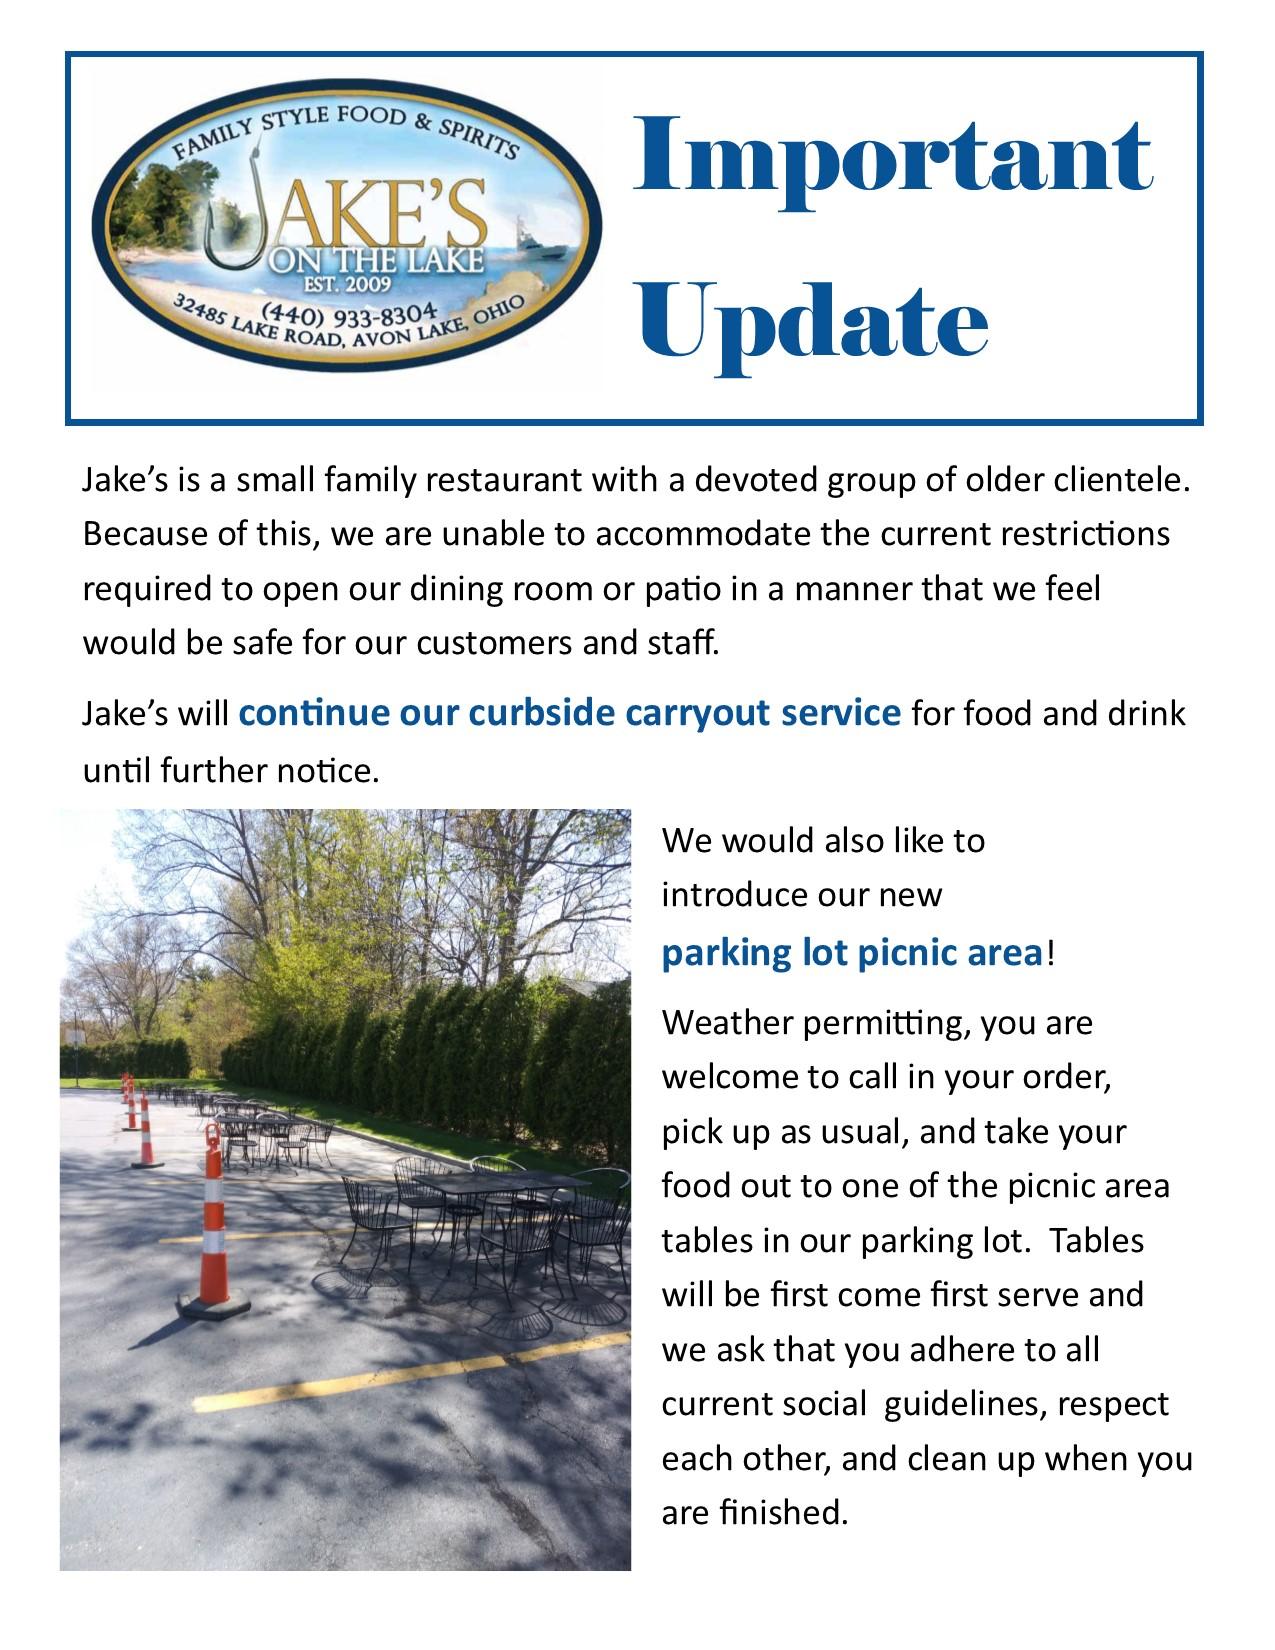 Parking lot Picnic Update